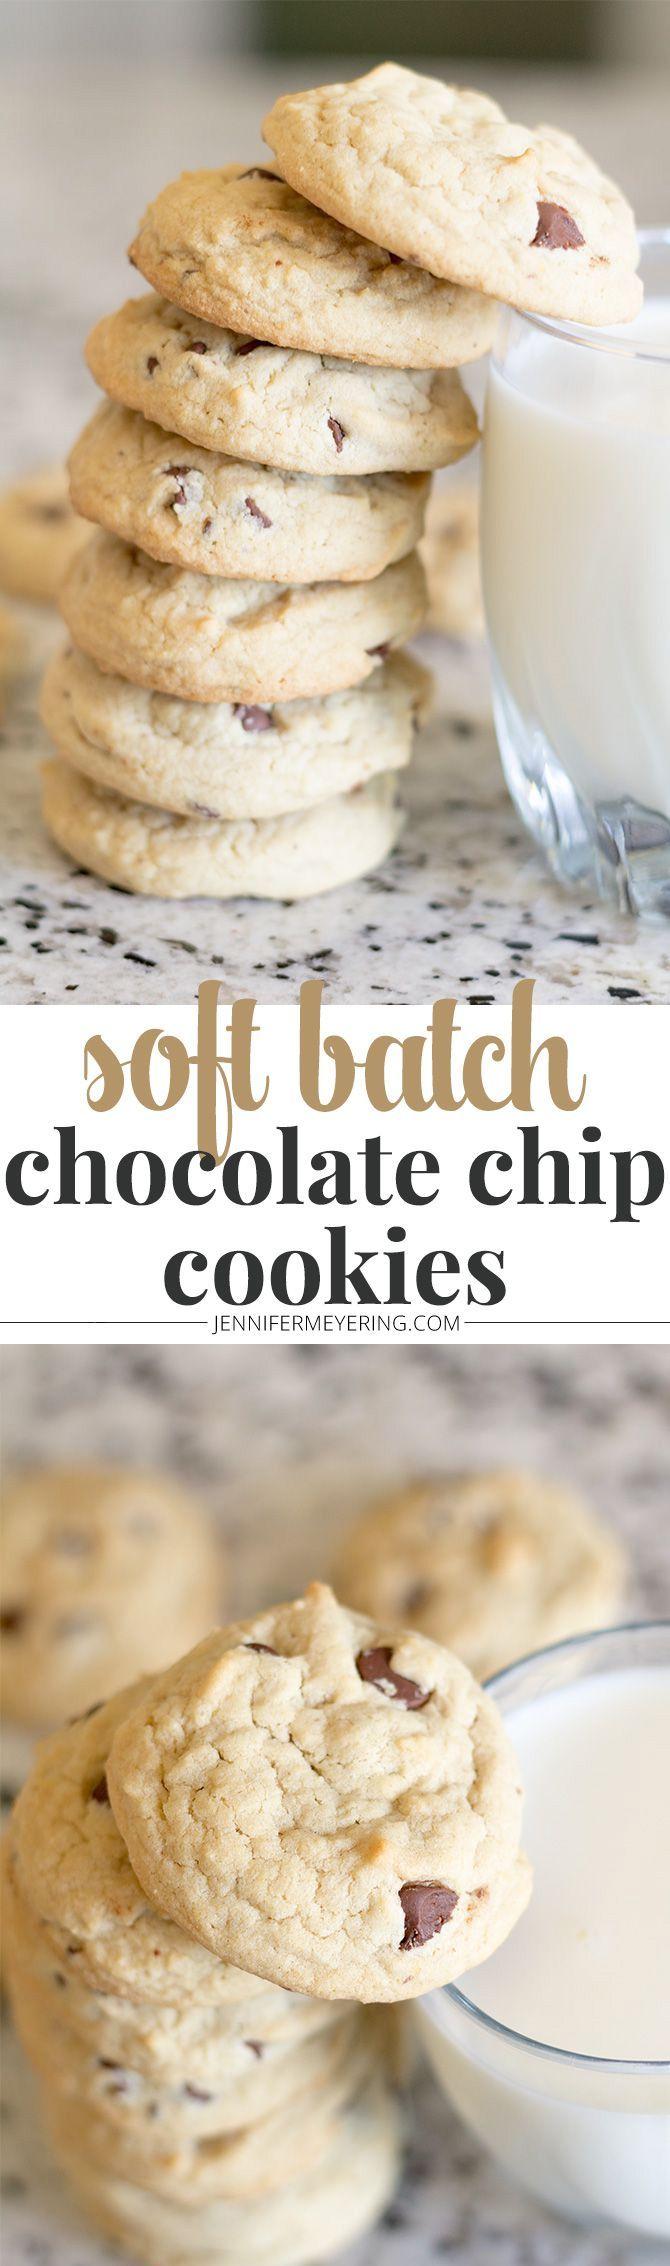 Classic Soft Batch Chocolate Chip Cookies - http://JenniferMeyering.com